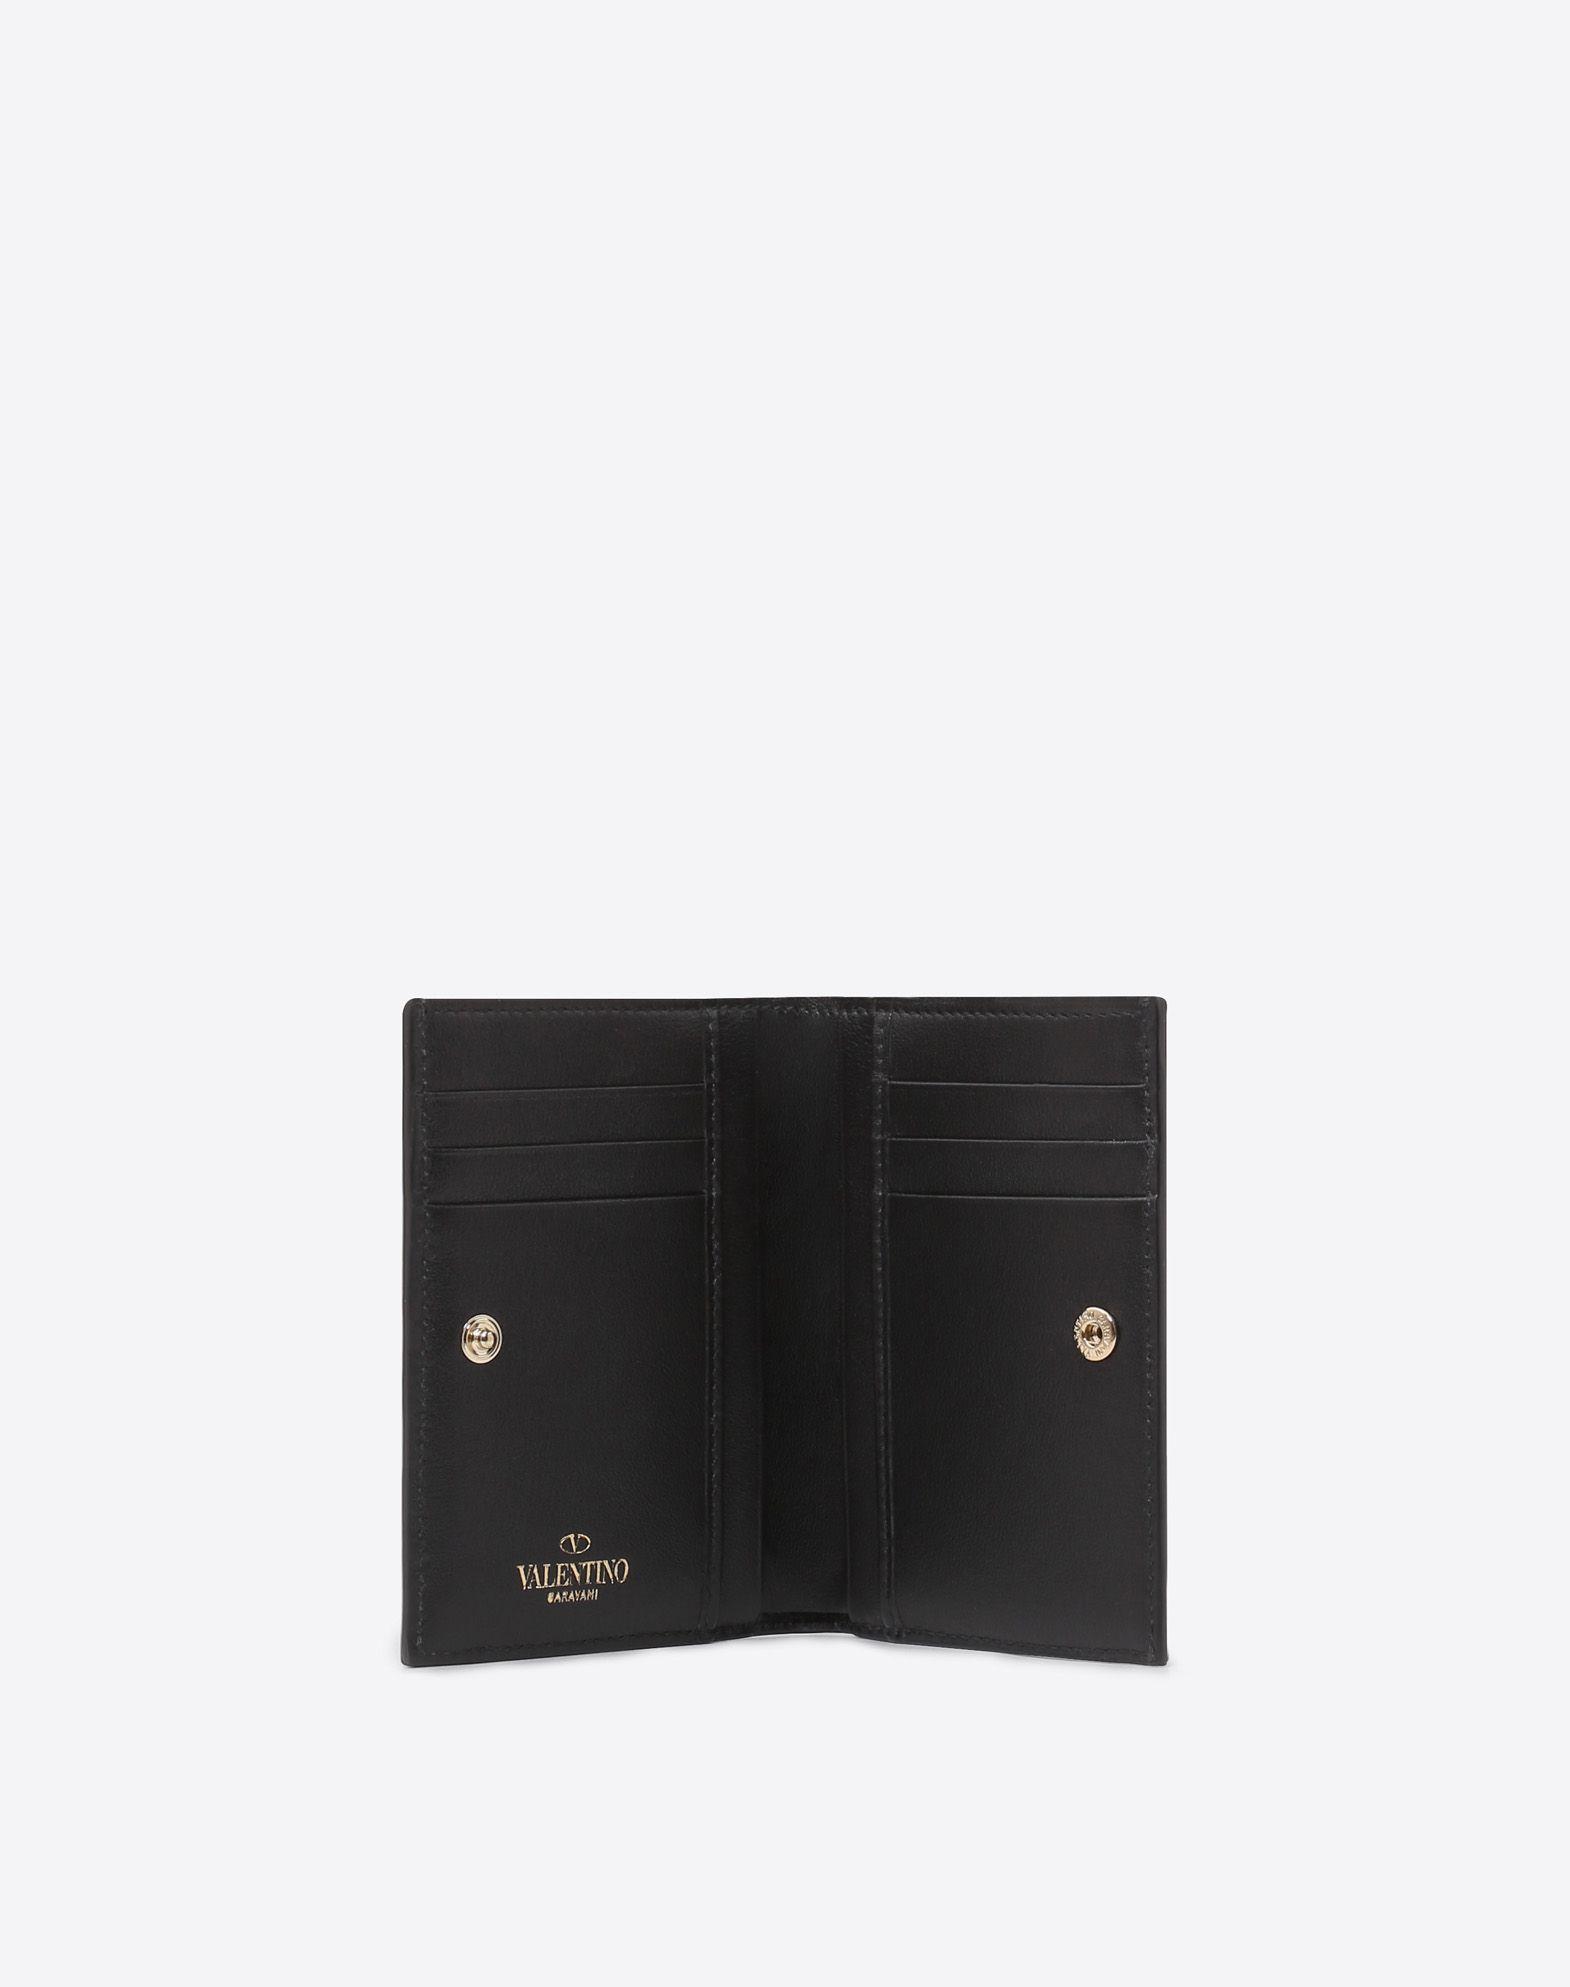 VALENTINO GARAVANI Rockstud Compact Wallet COMPACT WALLETS E a